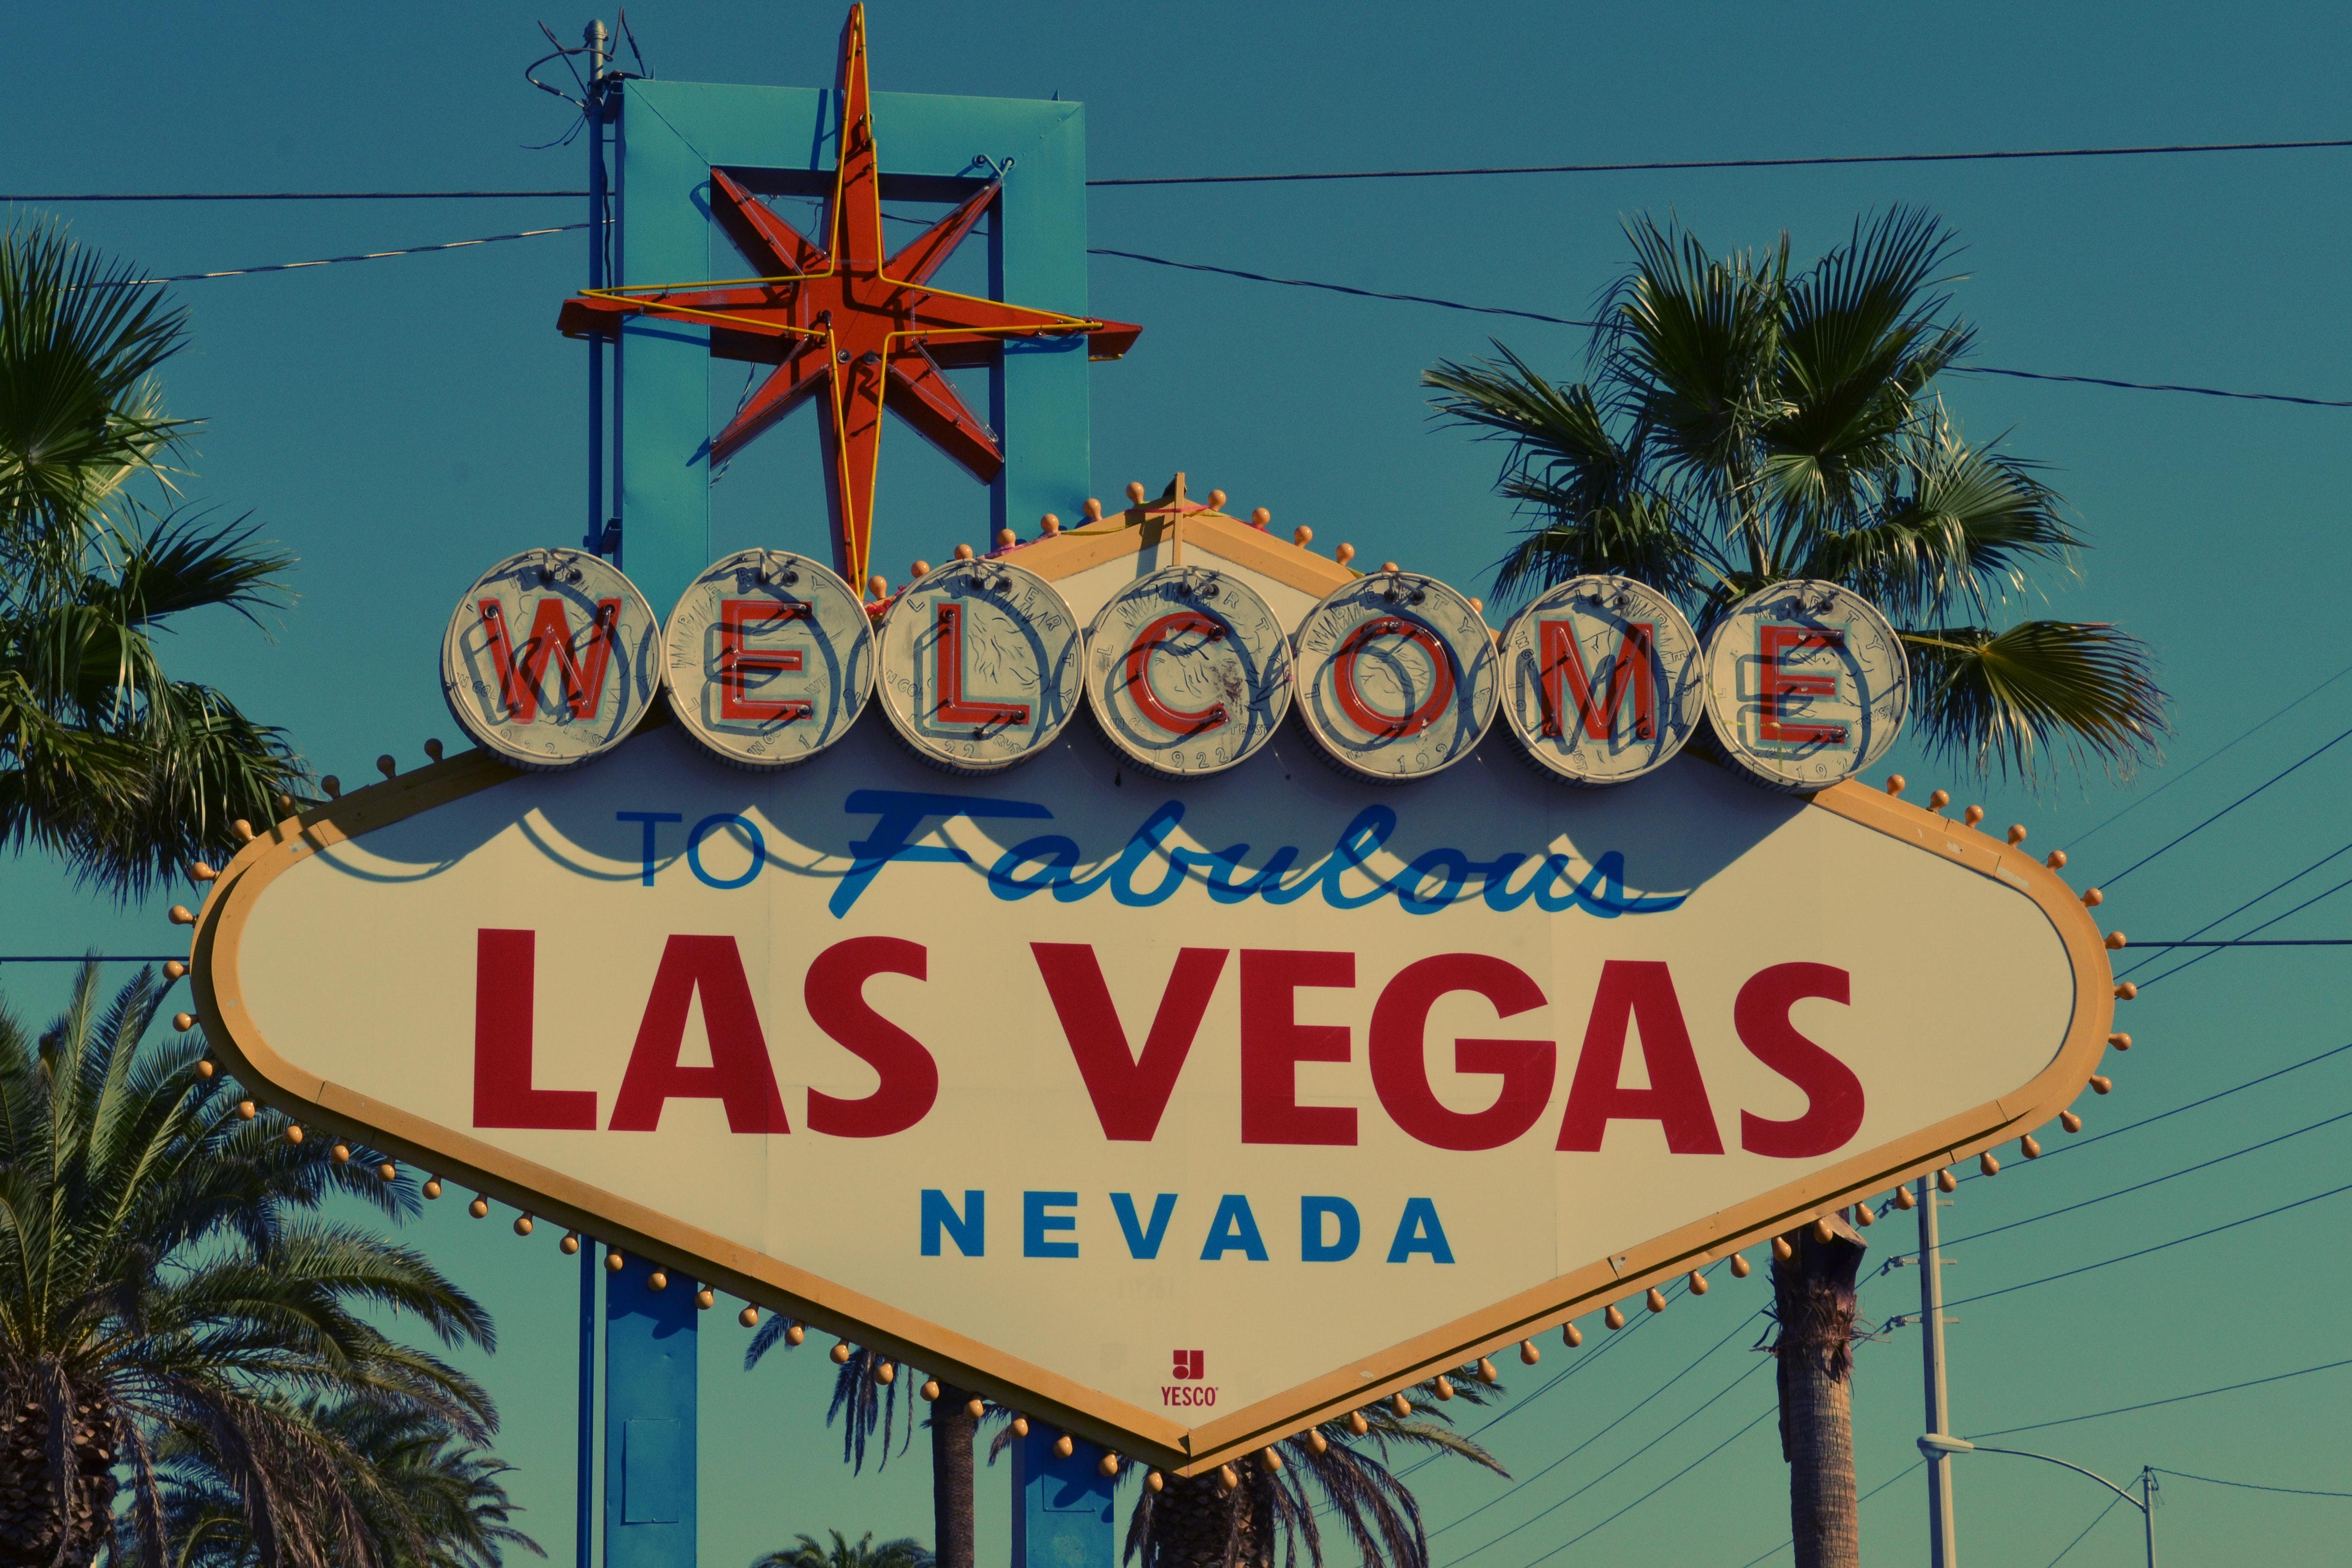 Welcome to Fabulous Las Vegas Nevada Signage, Destination, Landmark, Las Vegas, Neon sign, HQ Photo